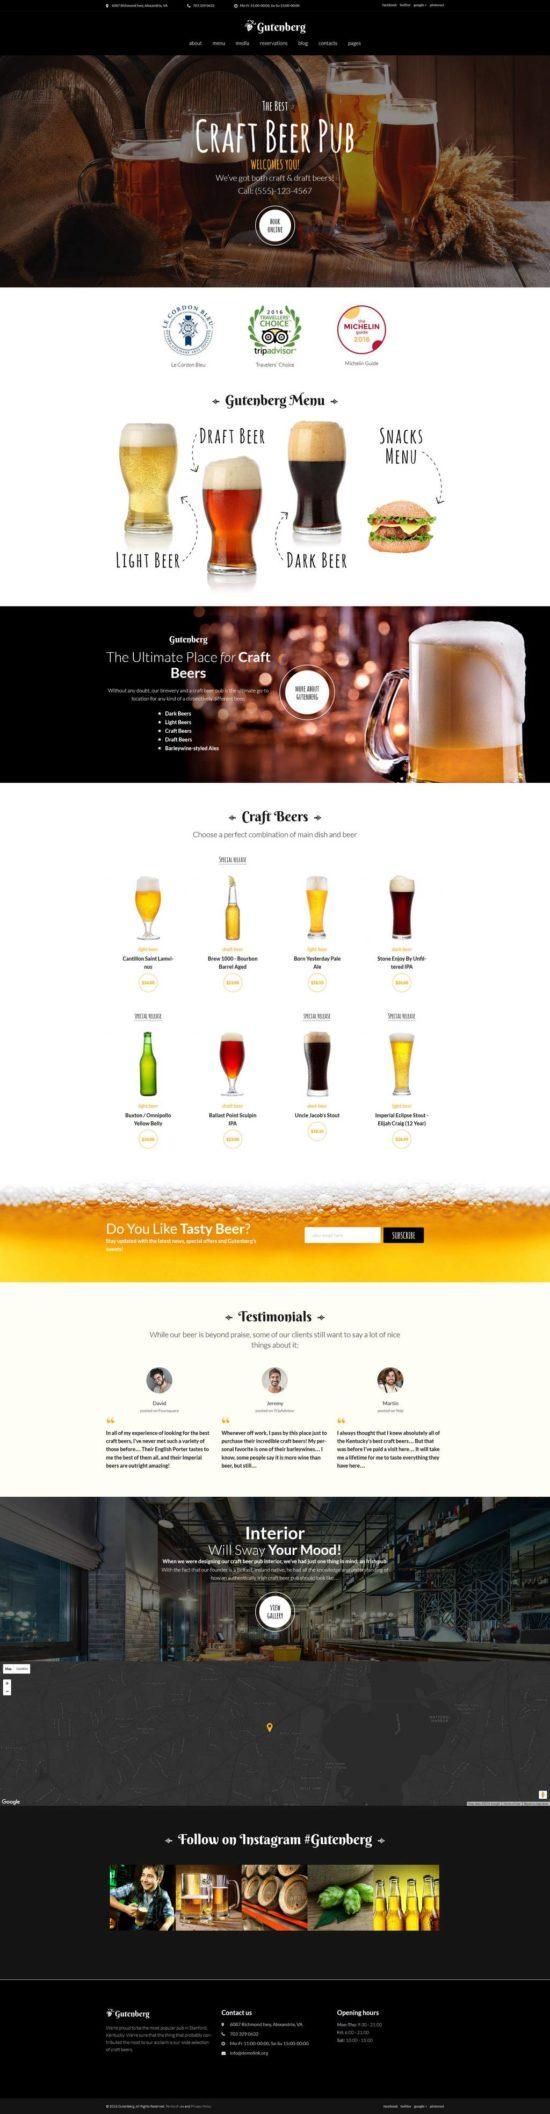 gutenberg templatemonster wordpress theme 01 550x2114 - GutenBerg WordPress Theme